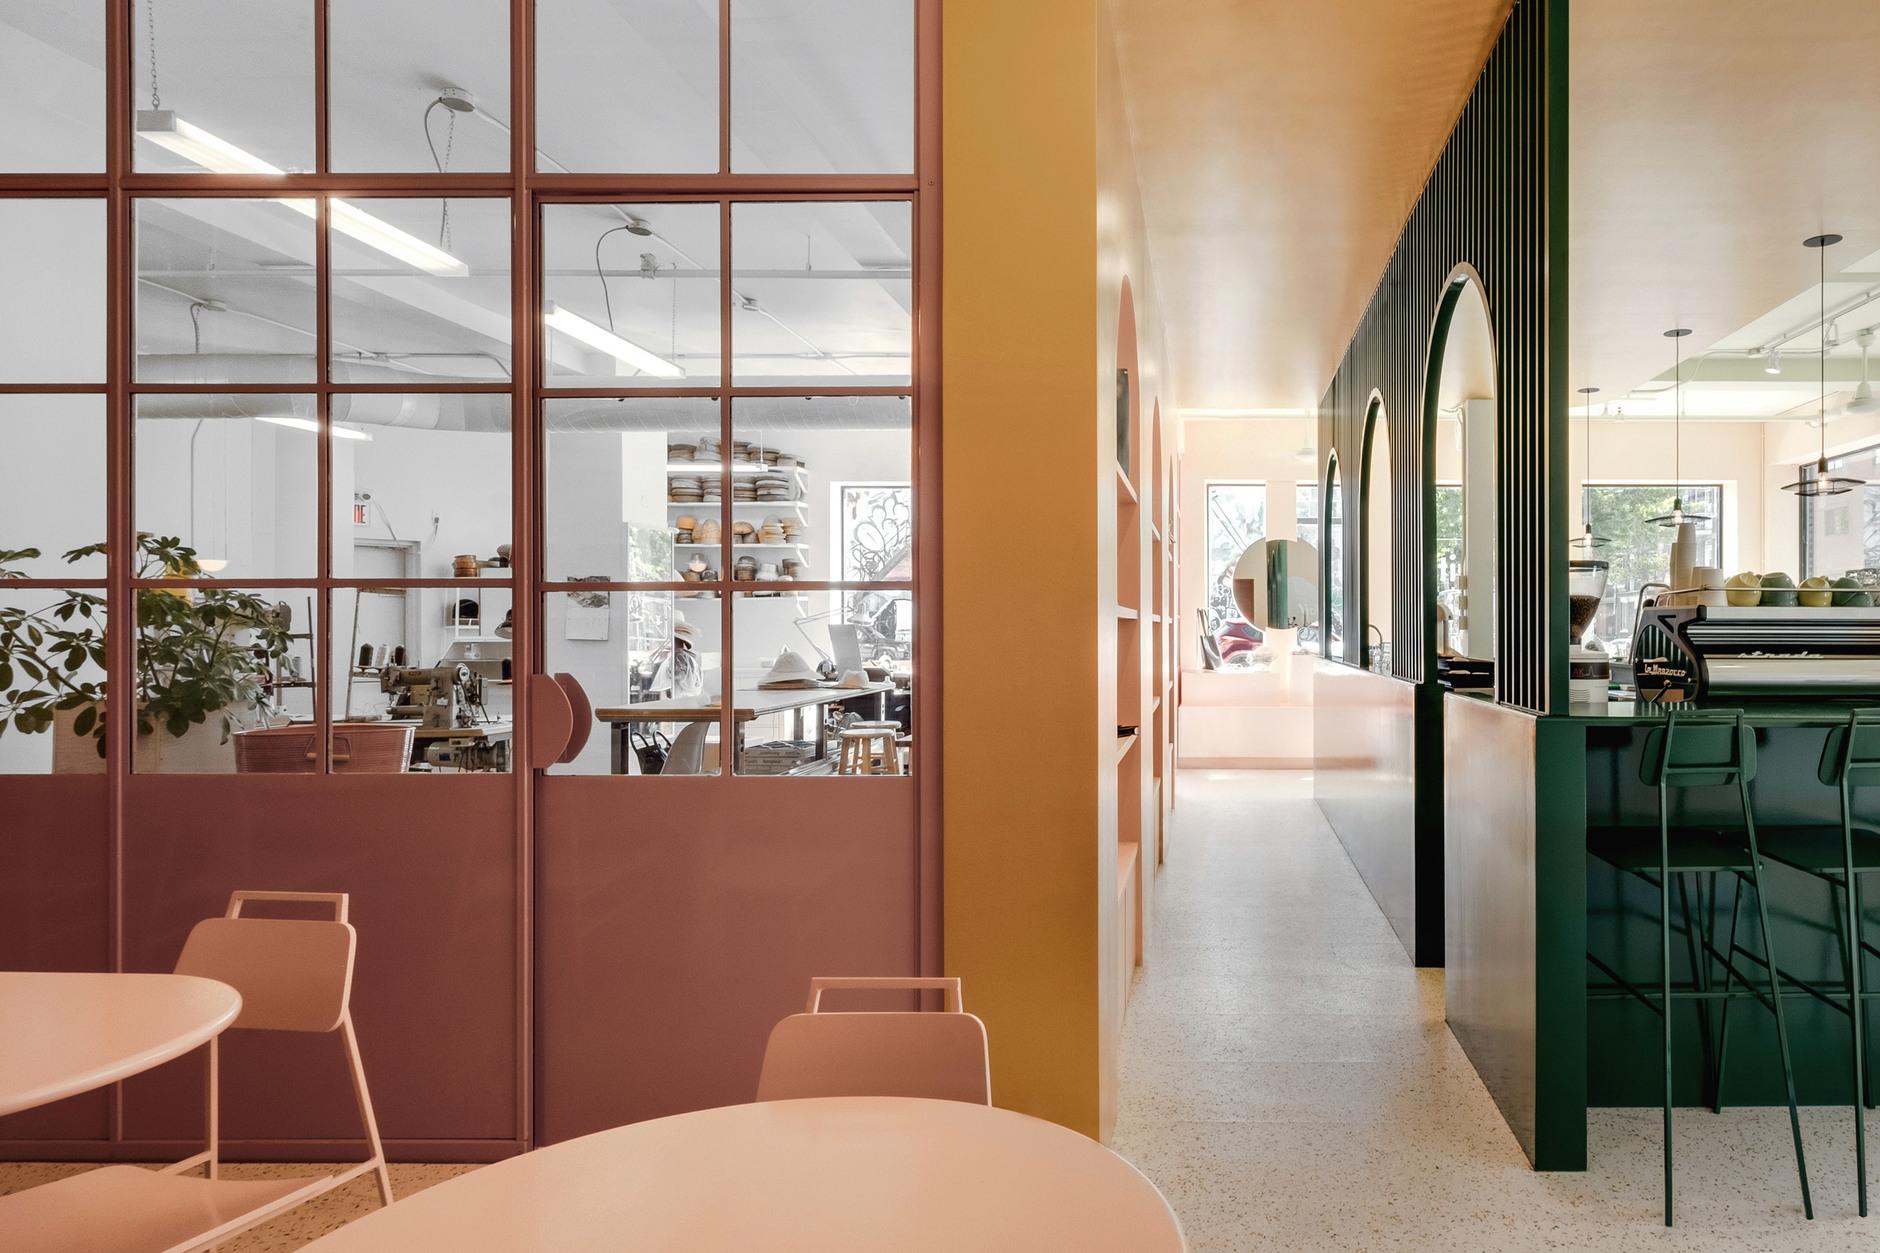 Яркий проект Pastel Rita в Монреале от студии Appareil Architecture (галерея 5, фото 1)